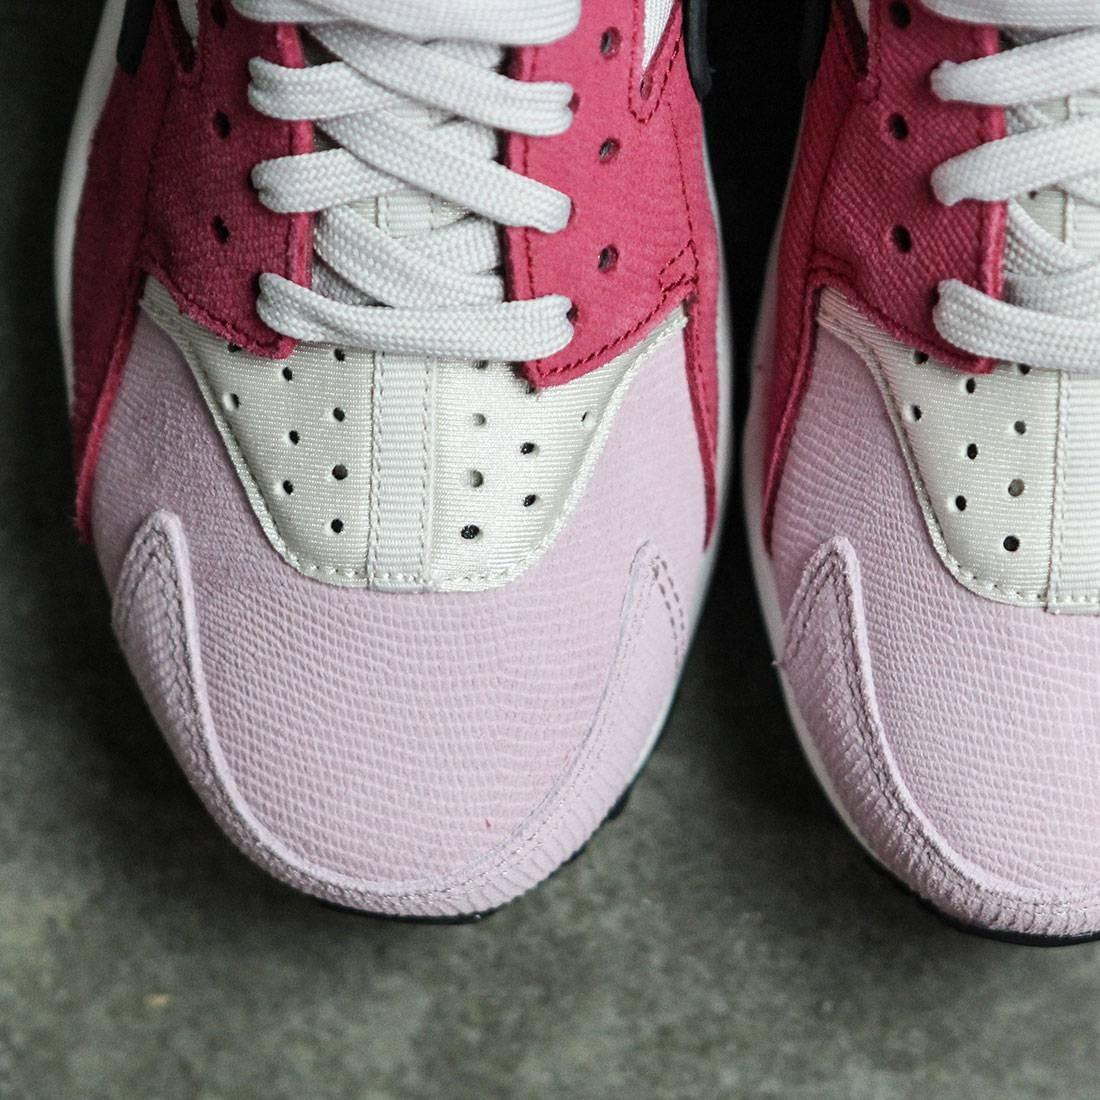 82c2a70ec007 Nike Women Women S Nike Air Huarache Run Premium (light bone   black-noble  red-plum fog)